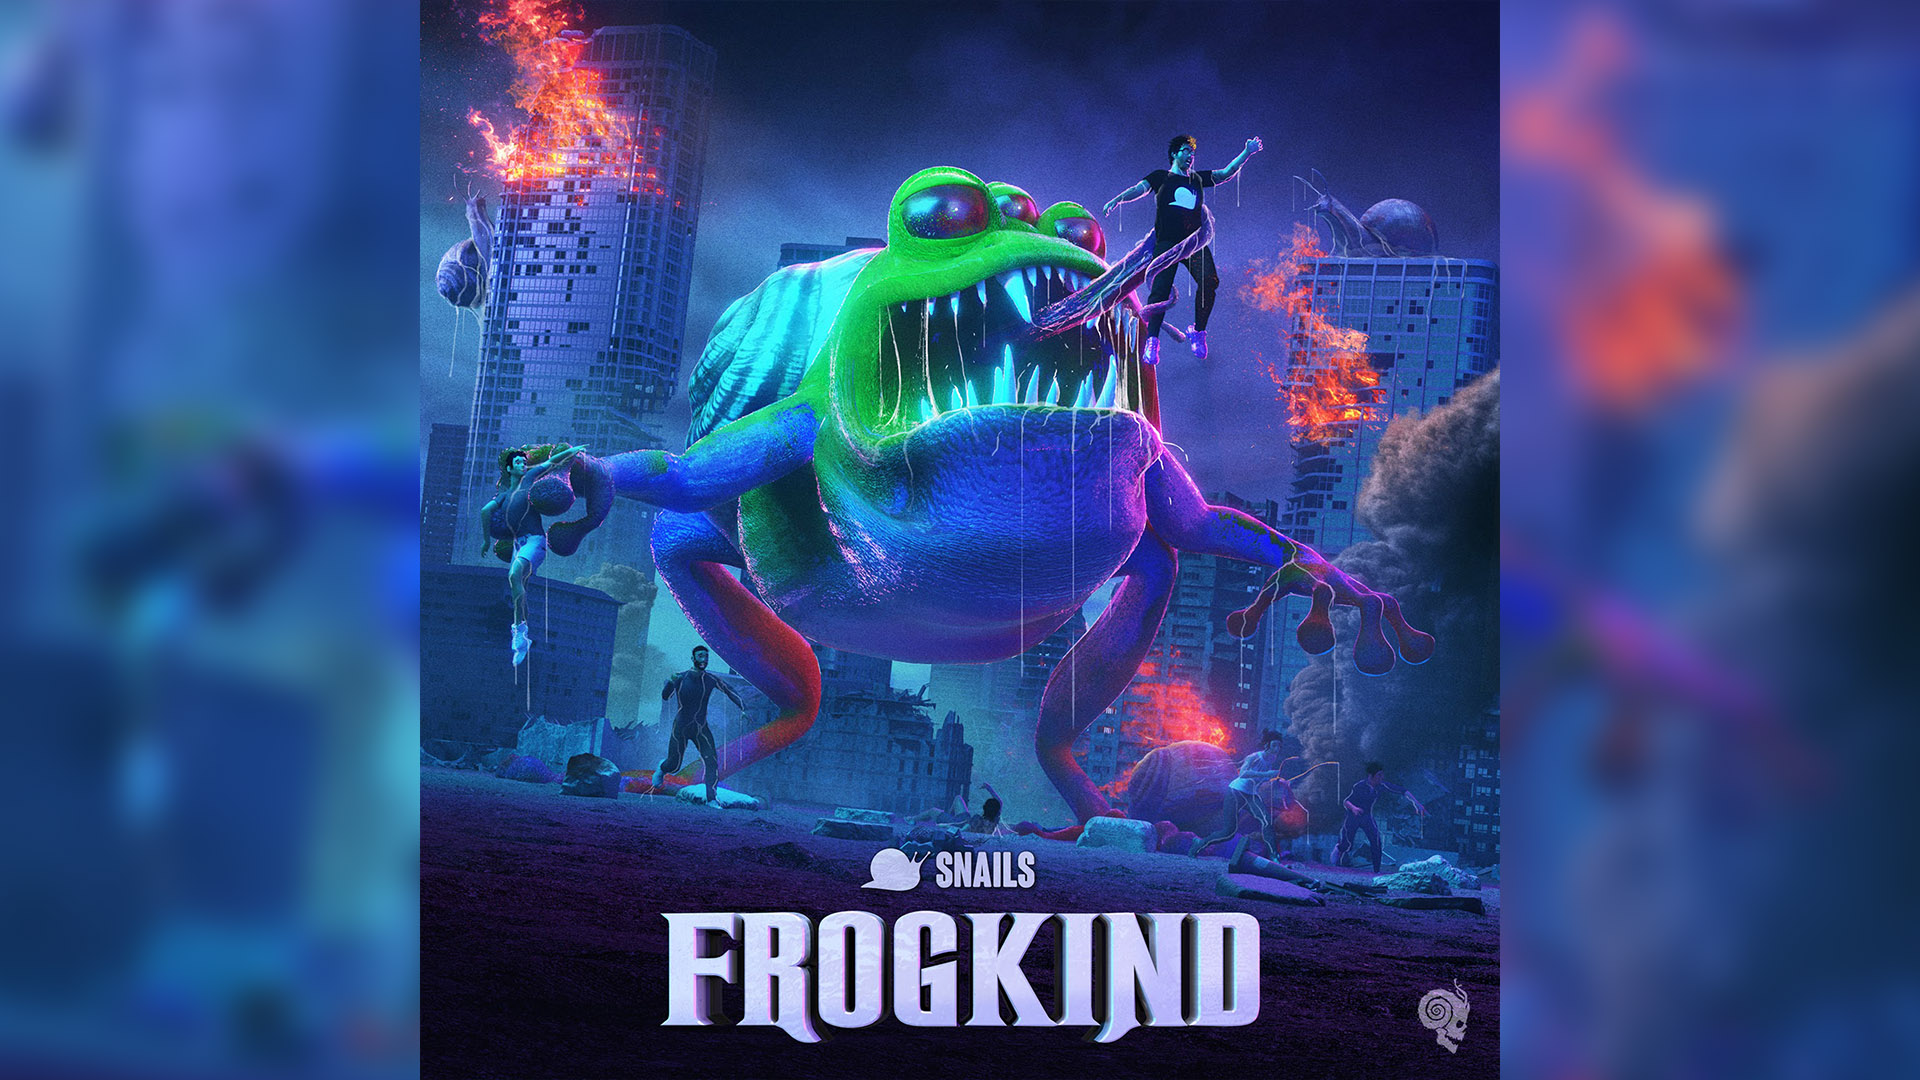 Frogkind